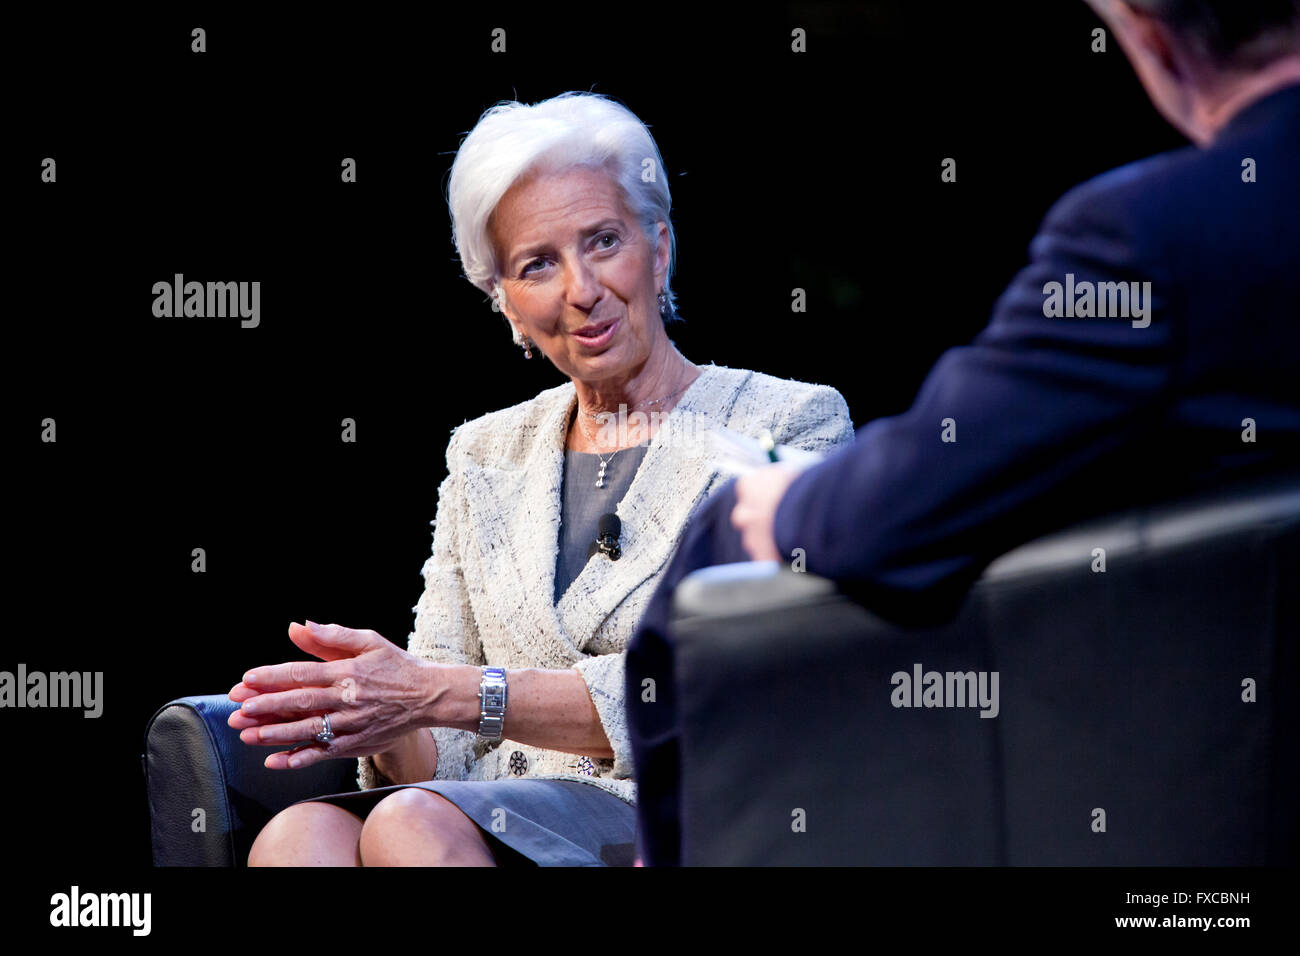 Washington DC, USA. 14th April, 2016. Managing  Christine Lagarde, Director of the International Monetary Fund (IMF), Stock Photo